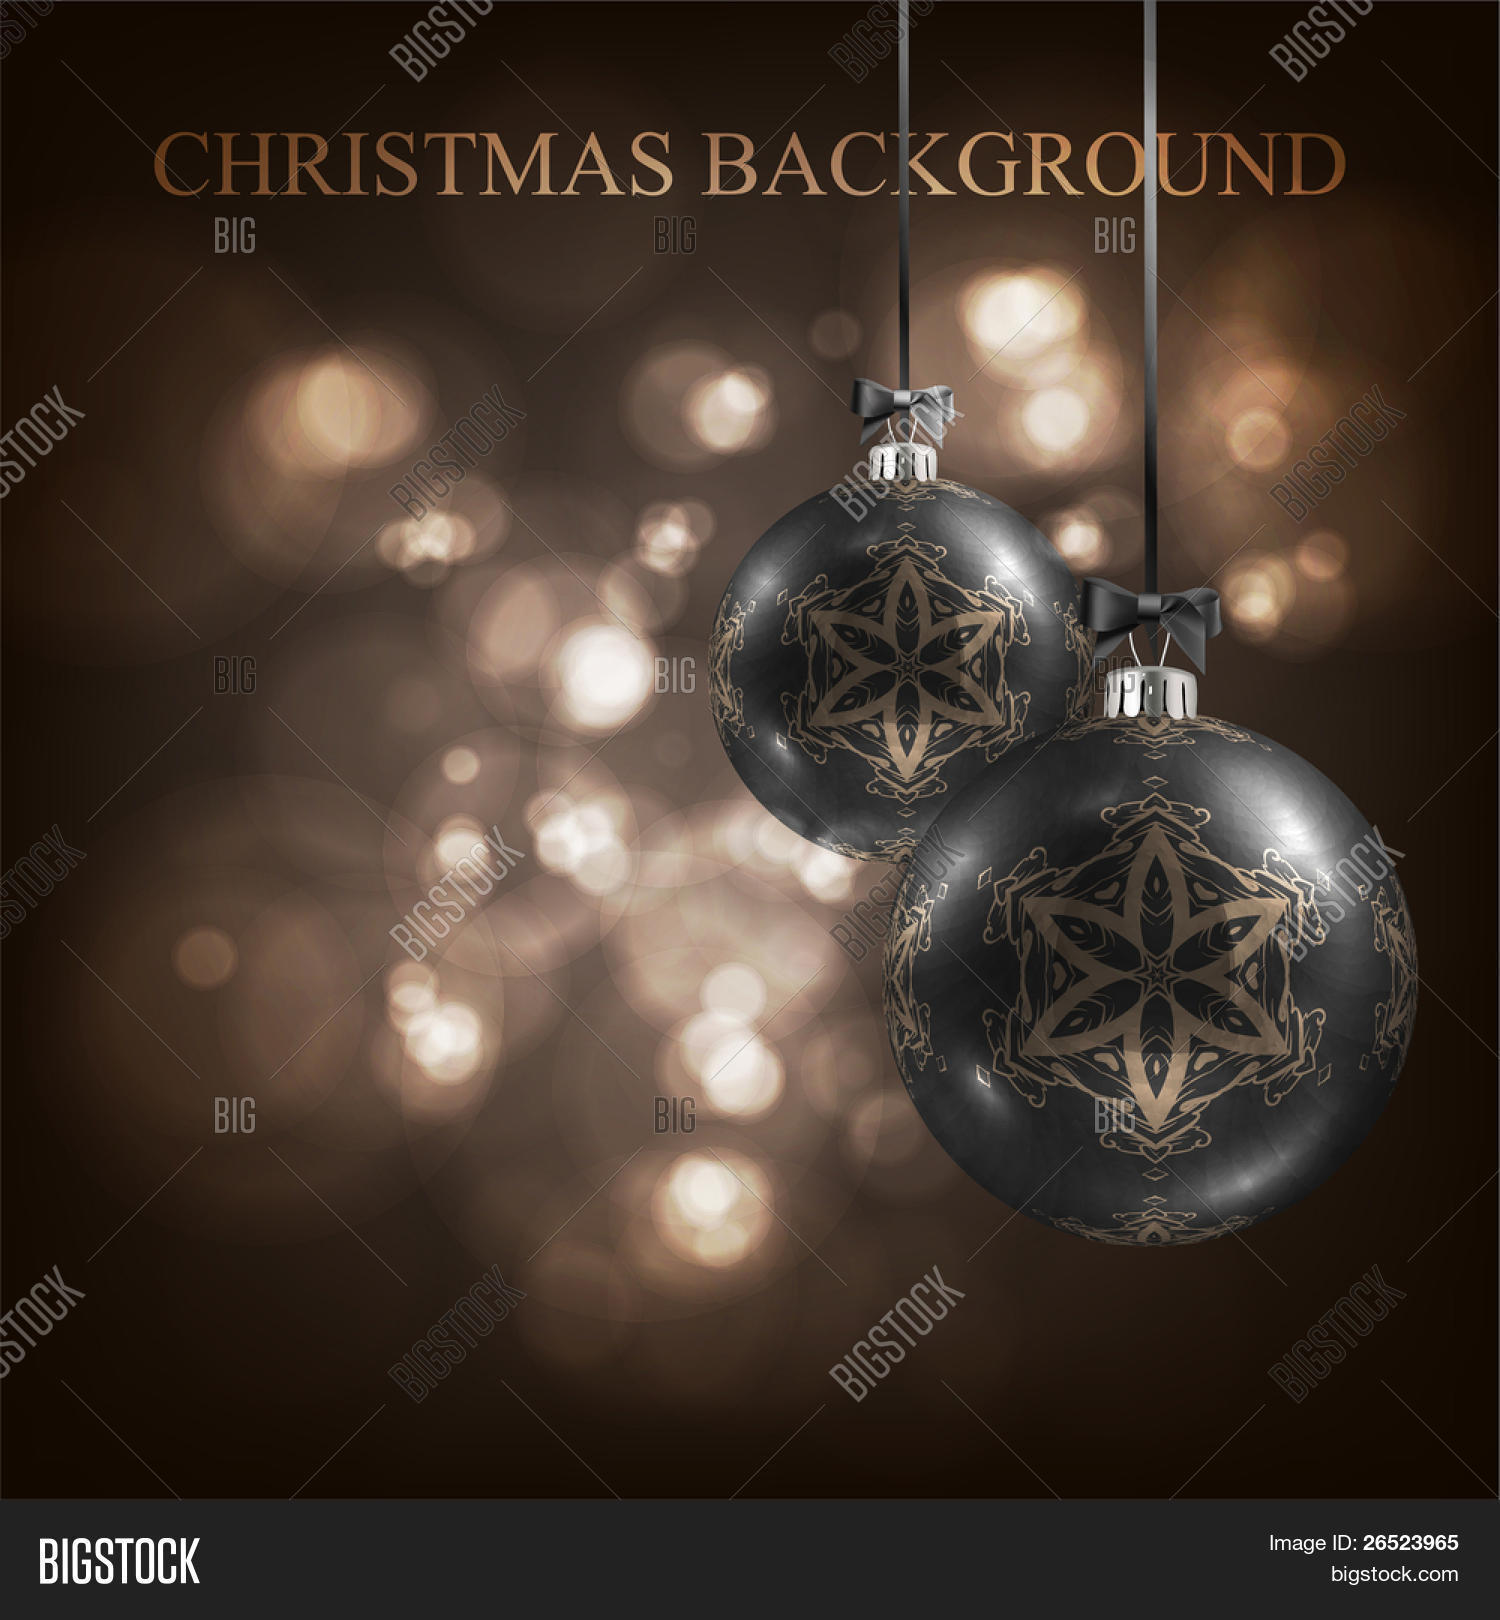 Elegant Christmas Background Images.Elegant Christmas Vector Photo Free Trial Bigstock